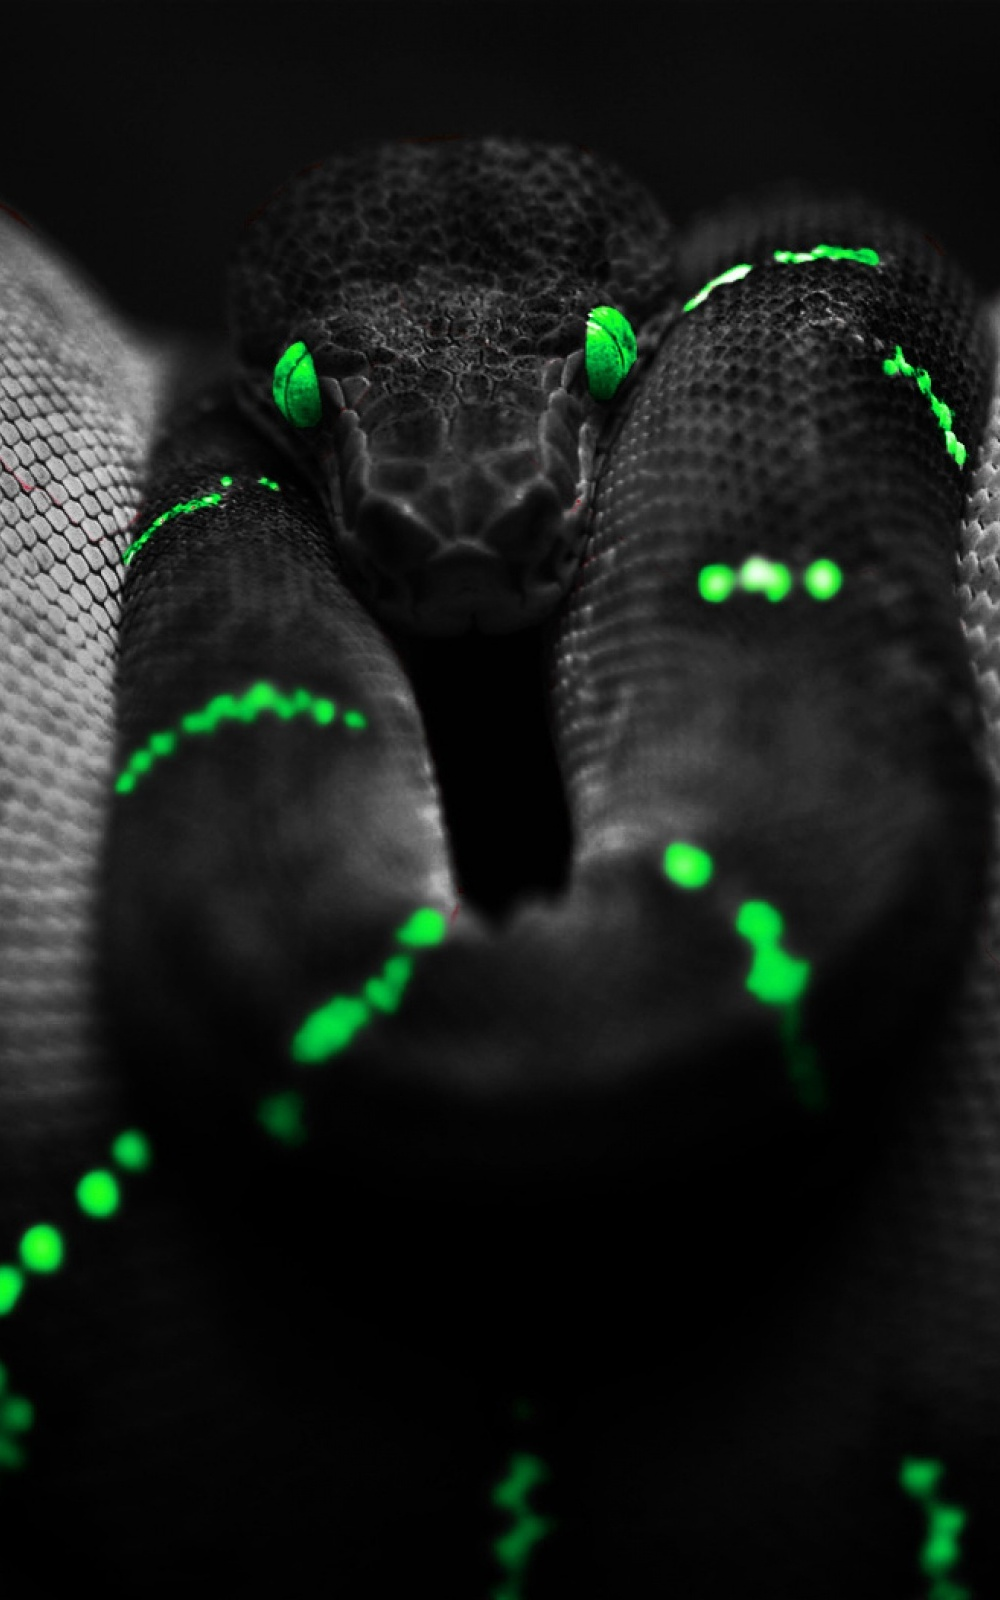 Free Download Black Snake Neon Green Iphone 6 Plus Hd